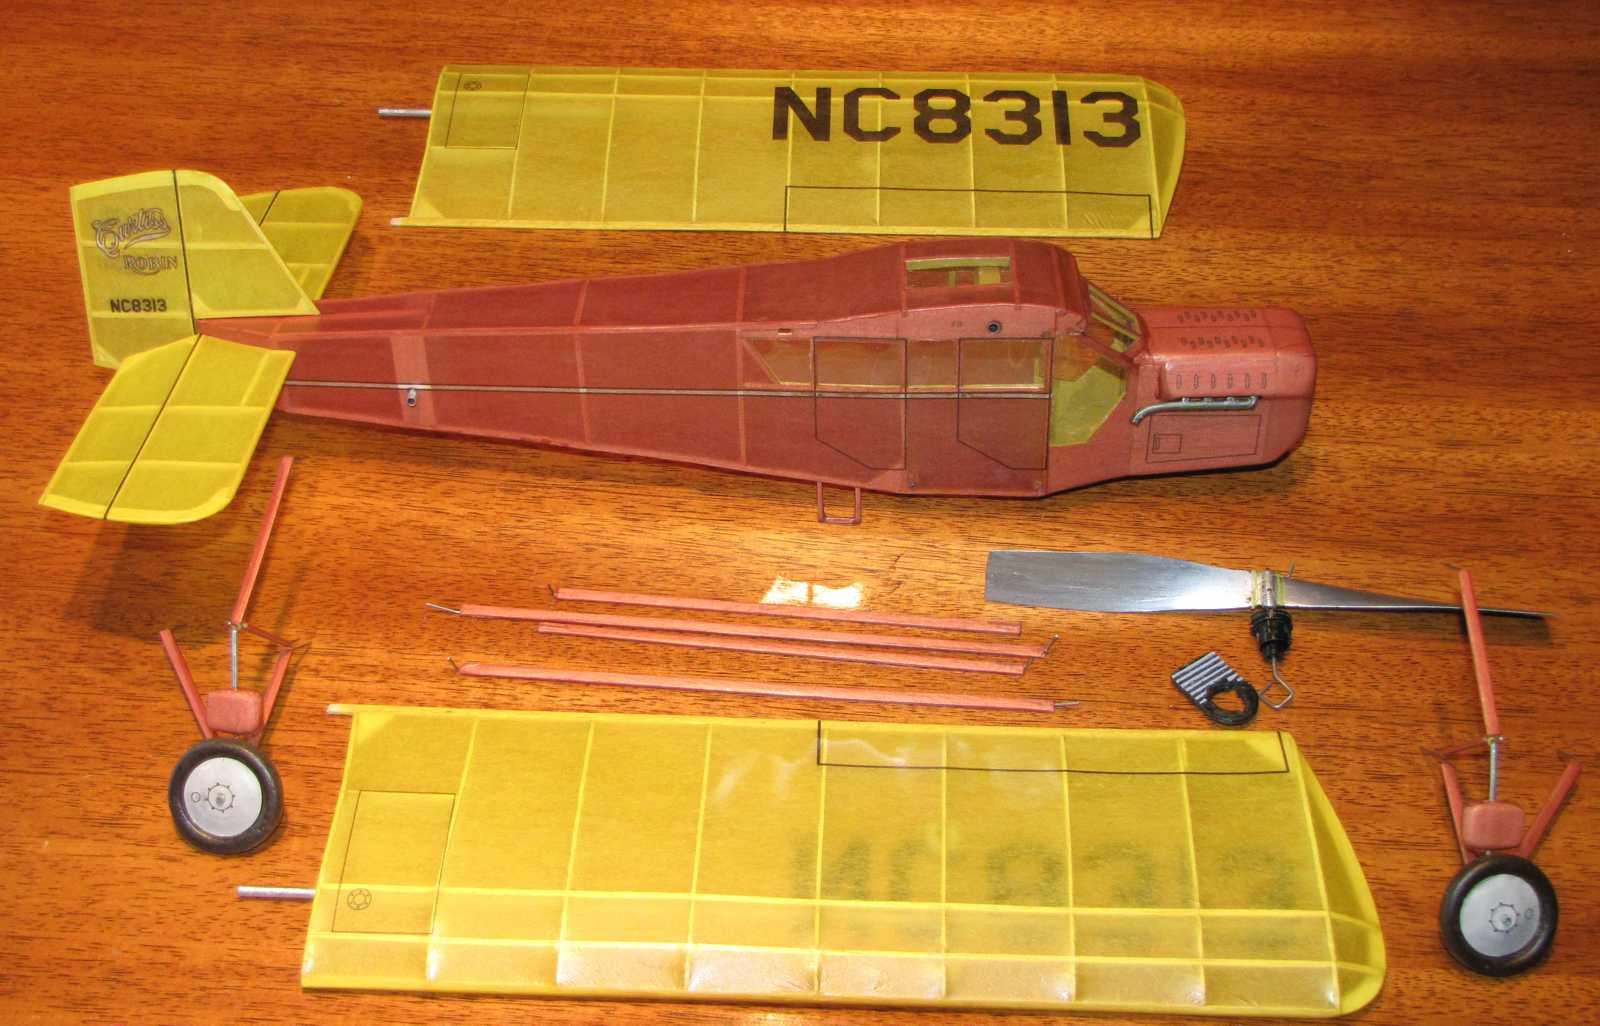 https://0201.nccdn.net/1_2/000/000/158/6f8/Curtiss-Robin_06F-1600x1026.jpg